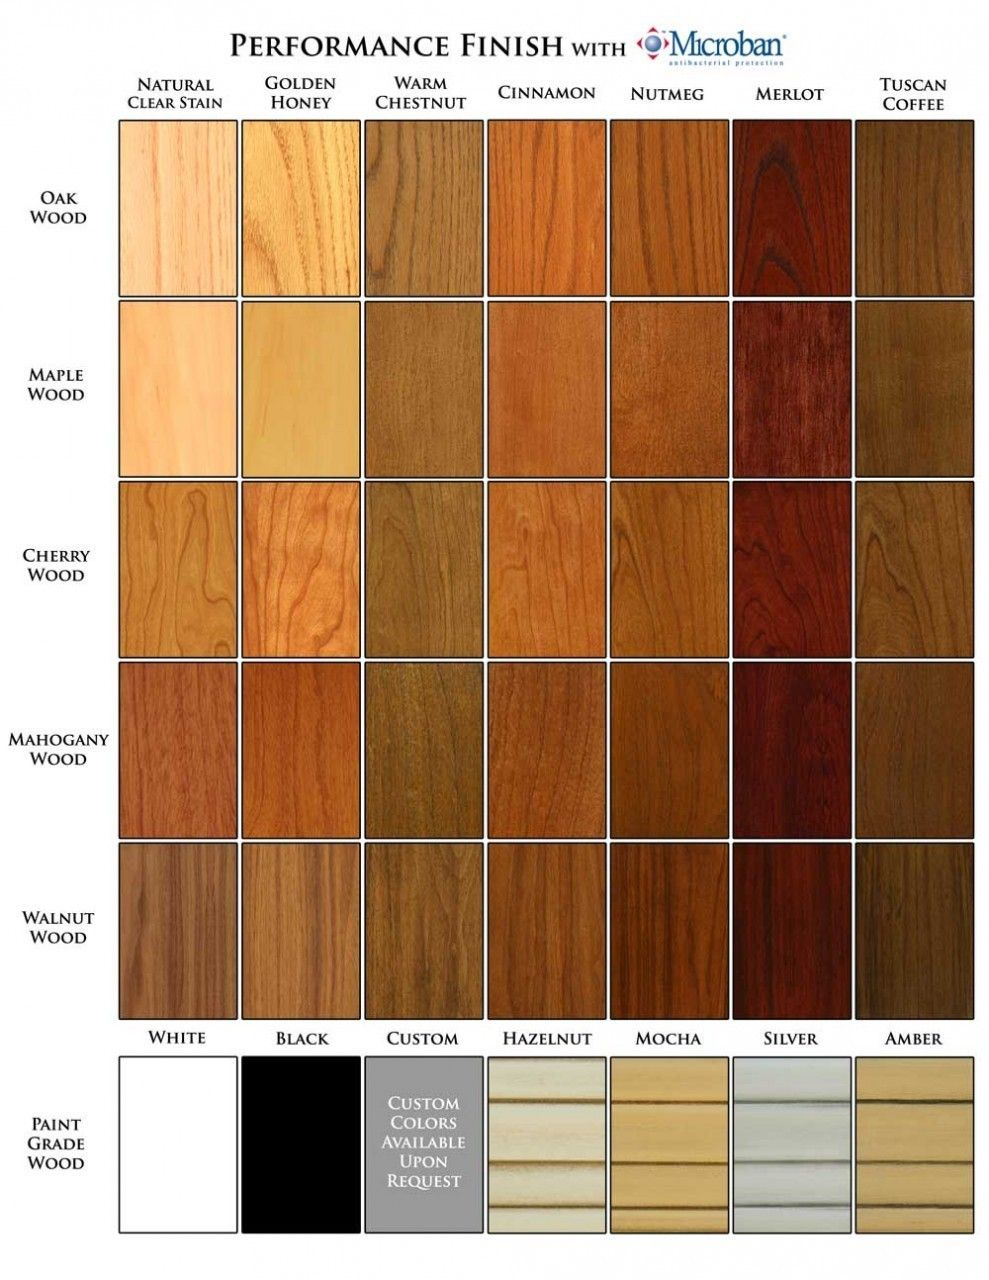 Fireplace Mantel Shelf Planking New England Classic And Cornice Wood Finish Samples Wood Cornice Wood Fireplace Mantel Wood Stain Colors